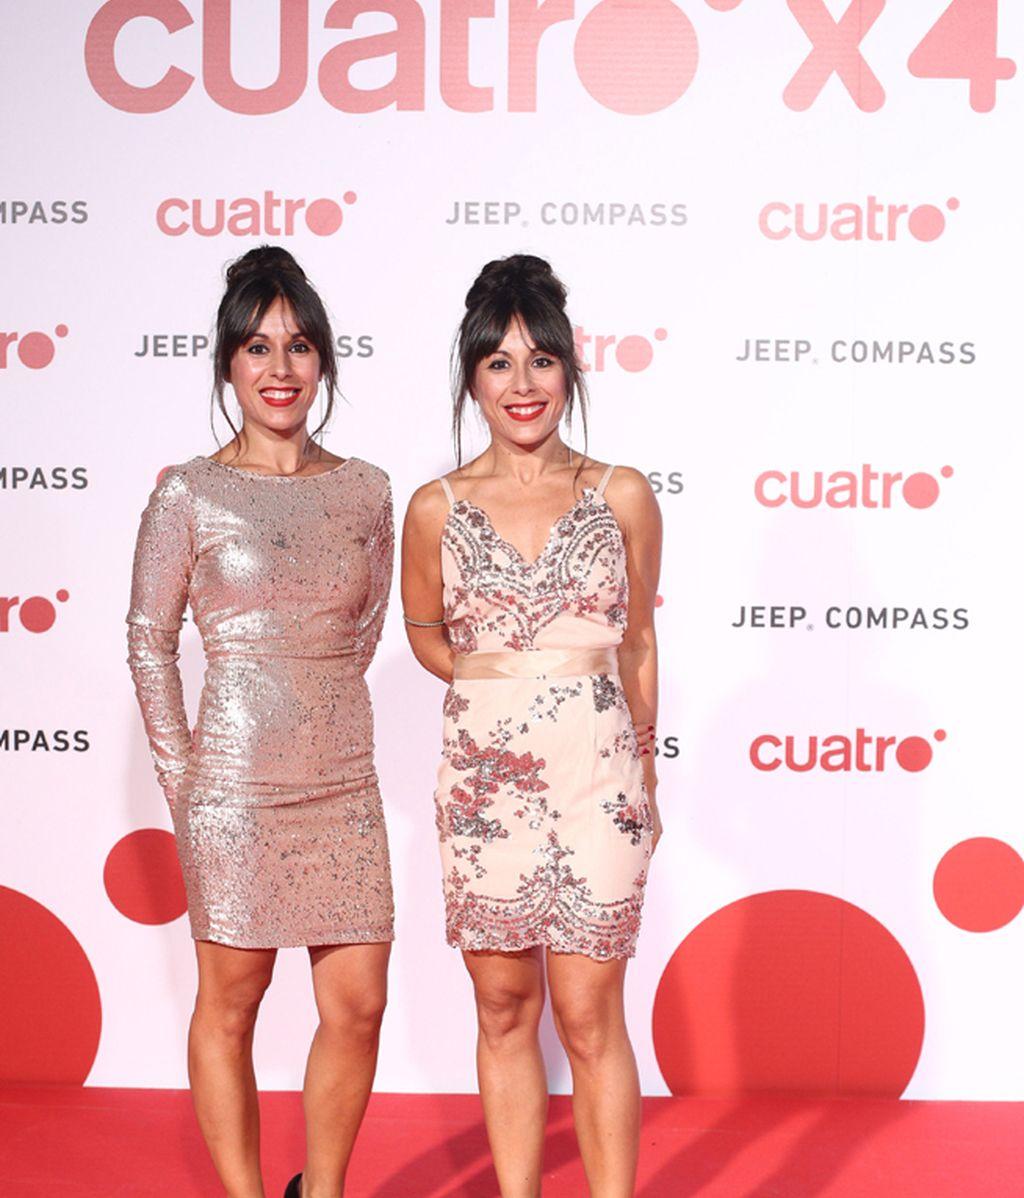 Cristina y Marisa Zapata